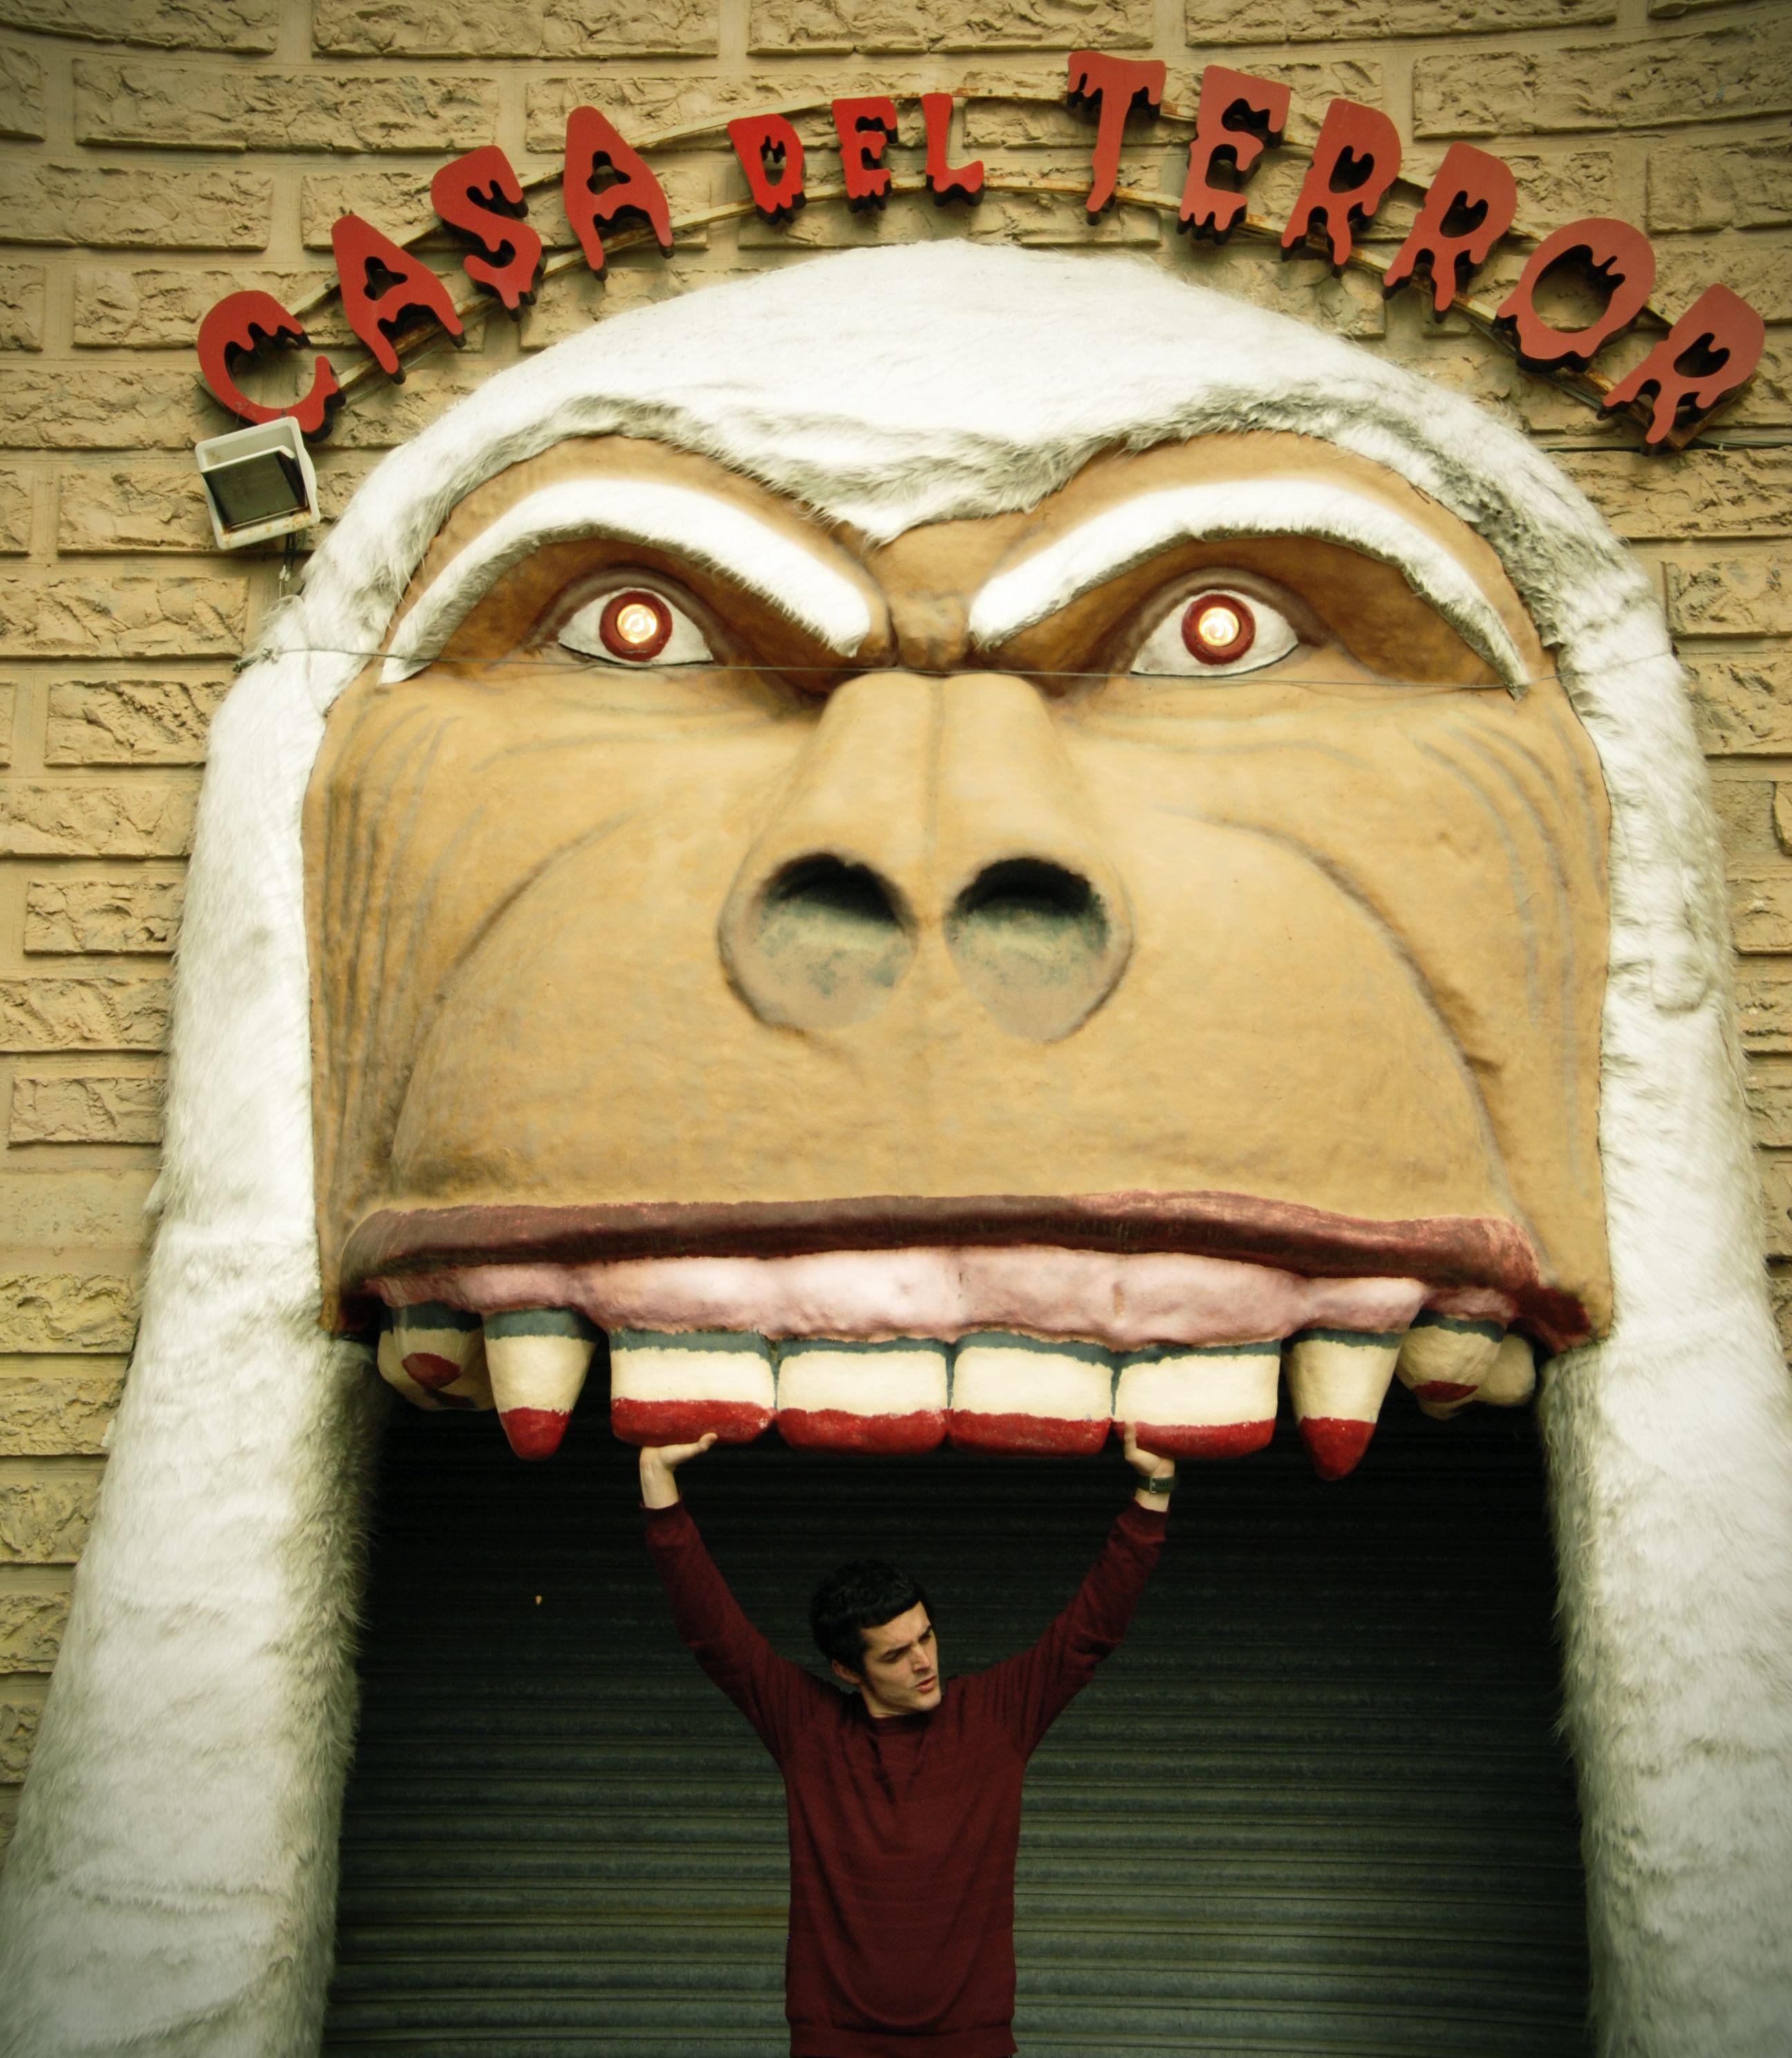 Gorila + Gorila = Terror. critical T_Rex